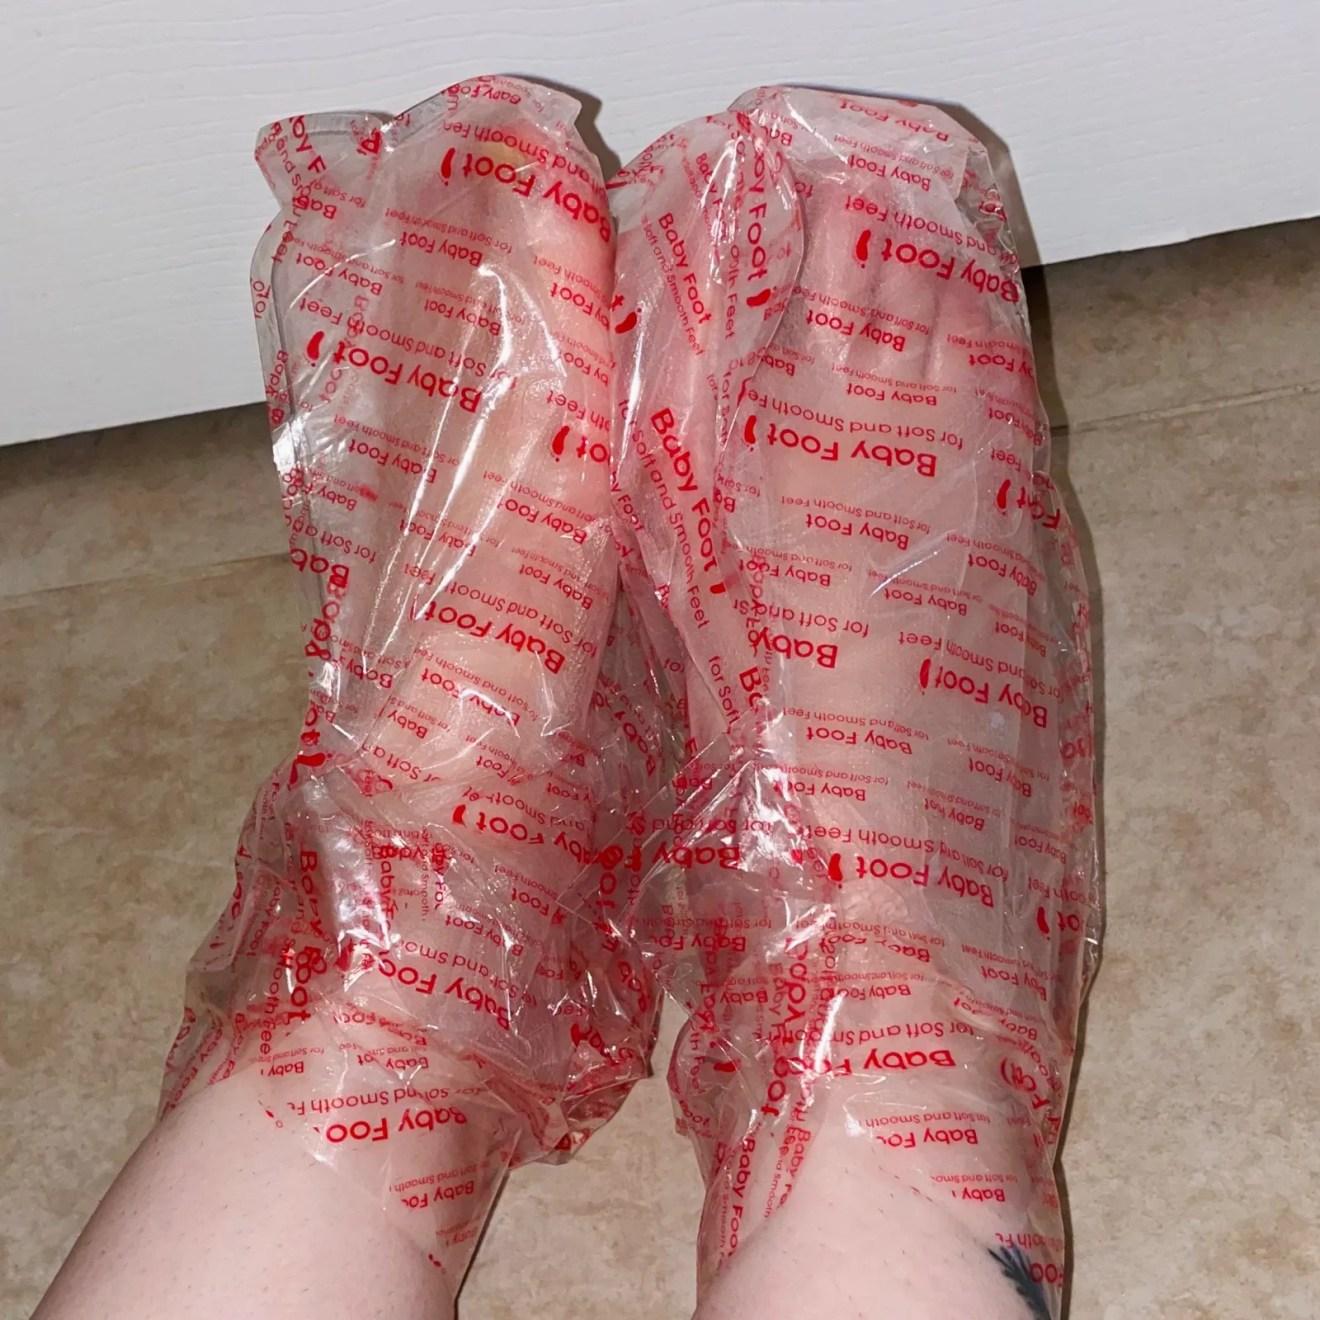 Feet wearing Baby Foot booties